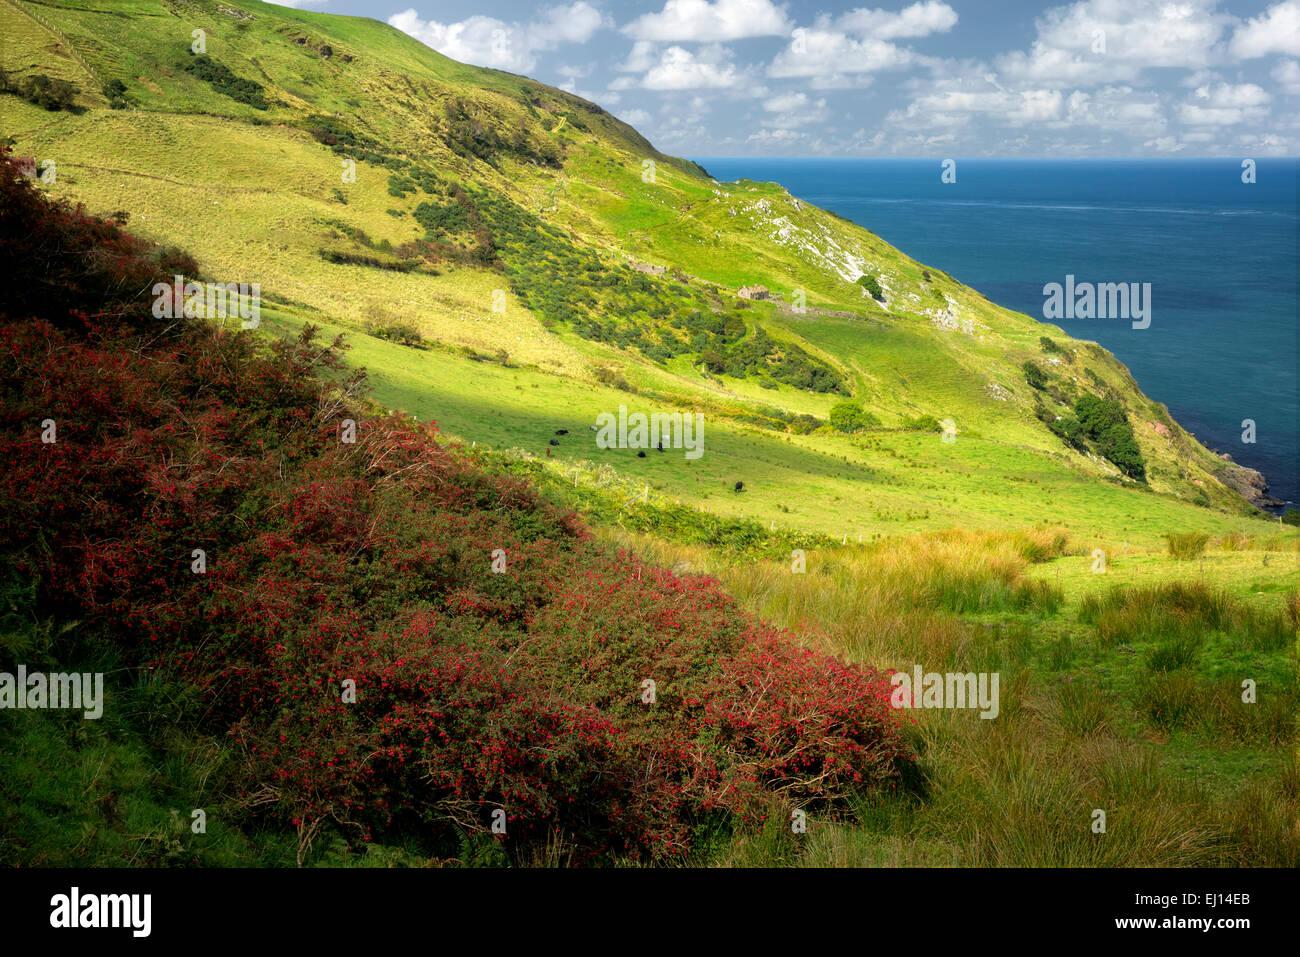 Fuschia growing wild. Torr Head. Northern Ireland. - Stock Image